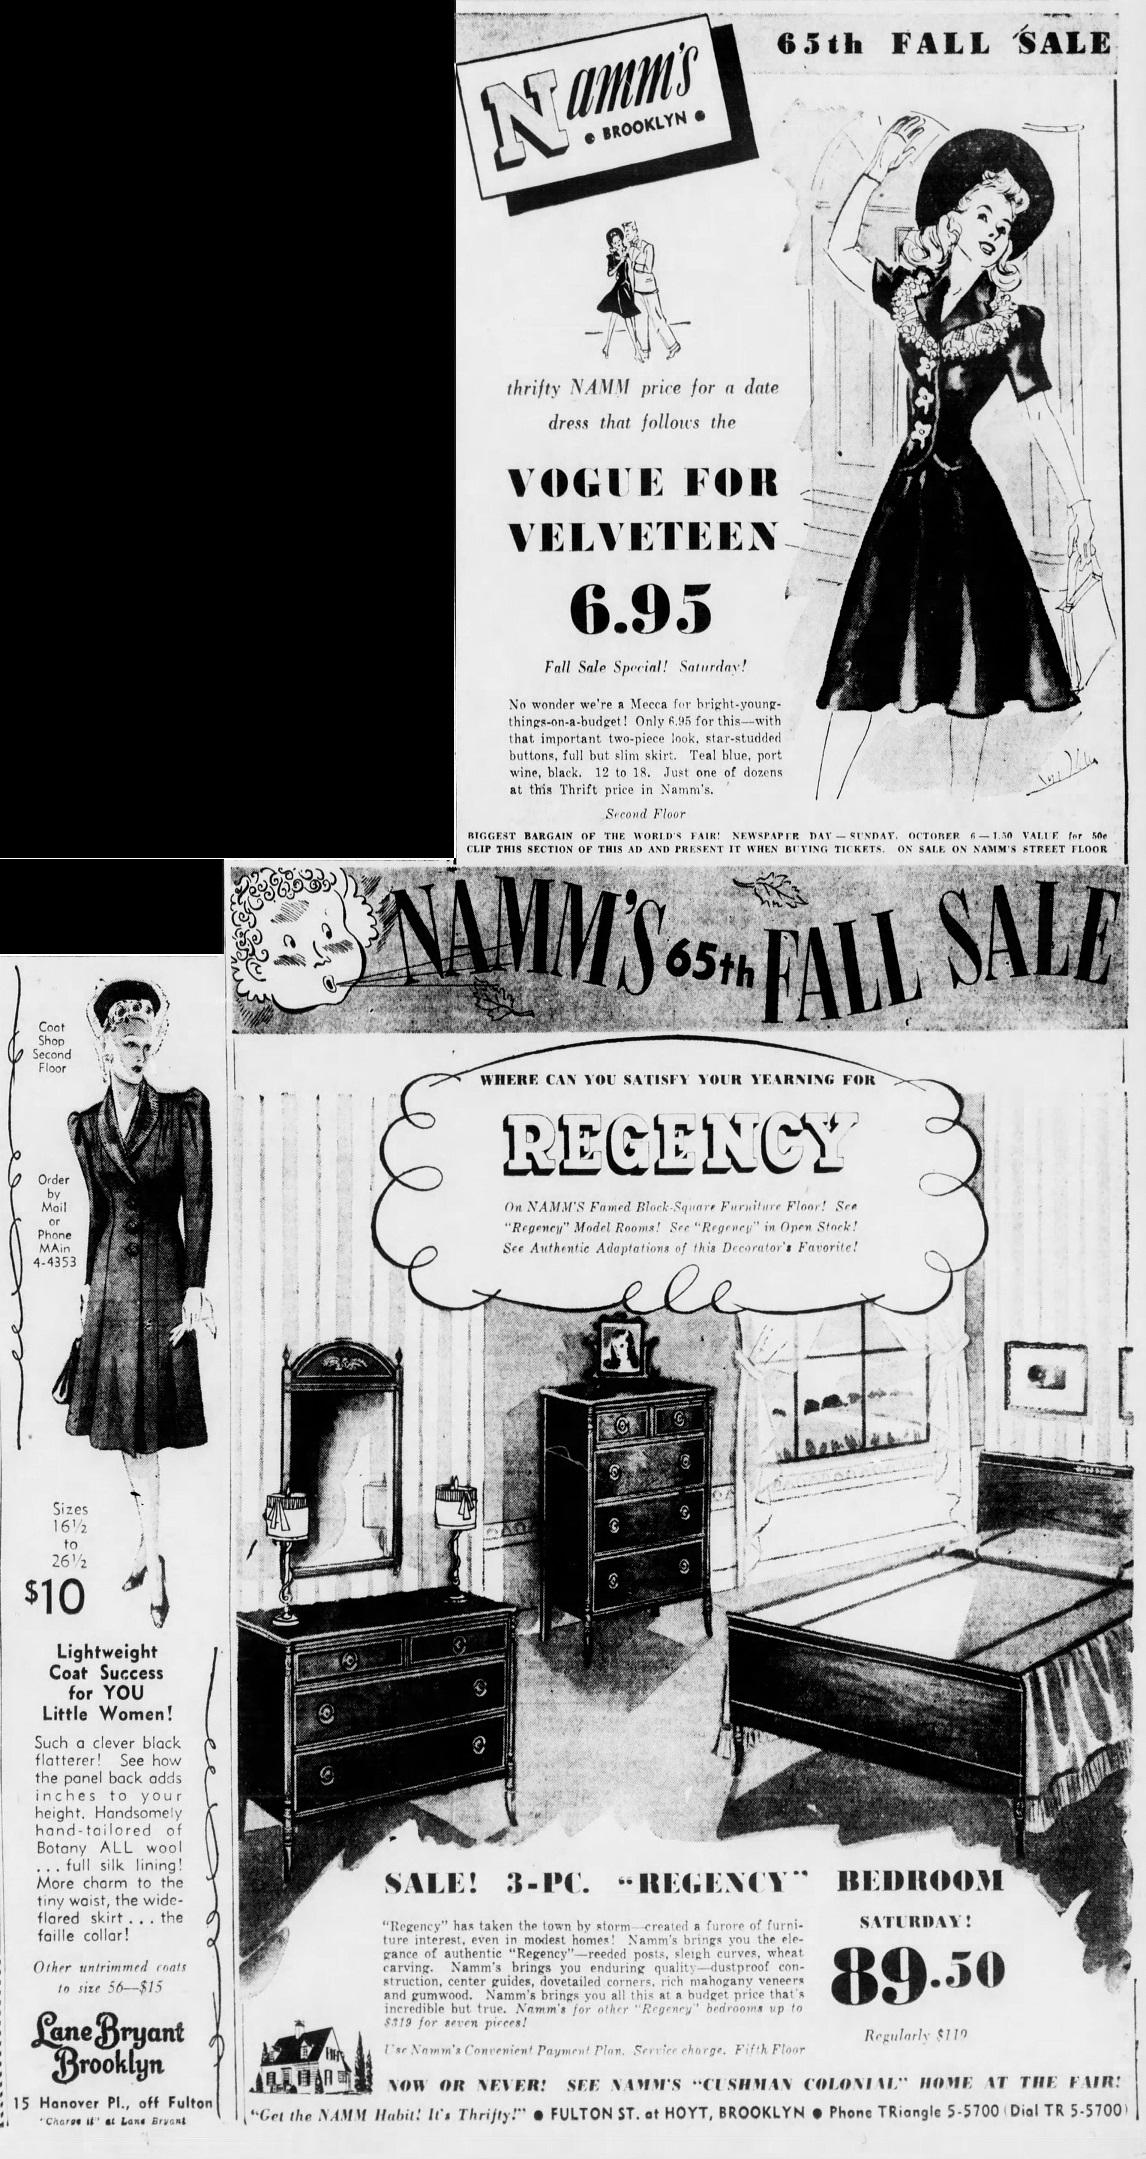 The_Brooklyn_Daily_Eagle_Fri__Sep_27__1940_(1).jpg